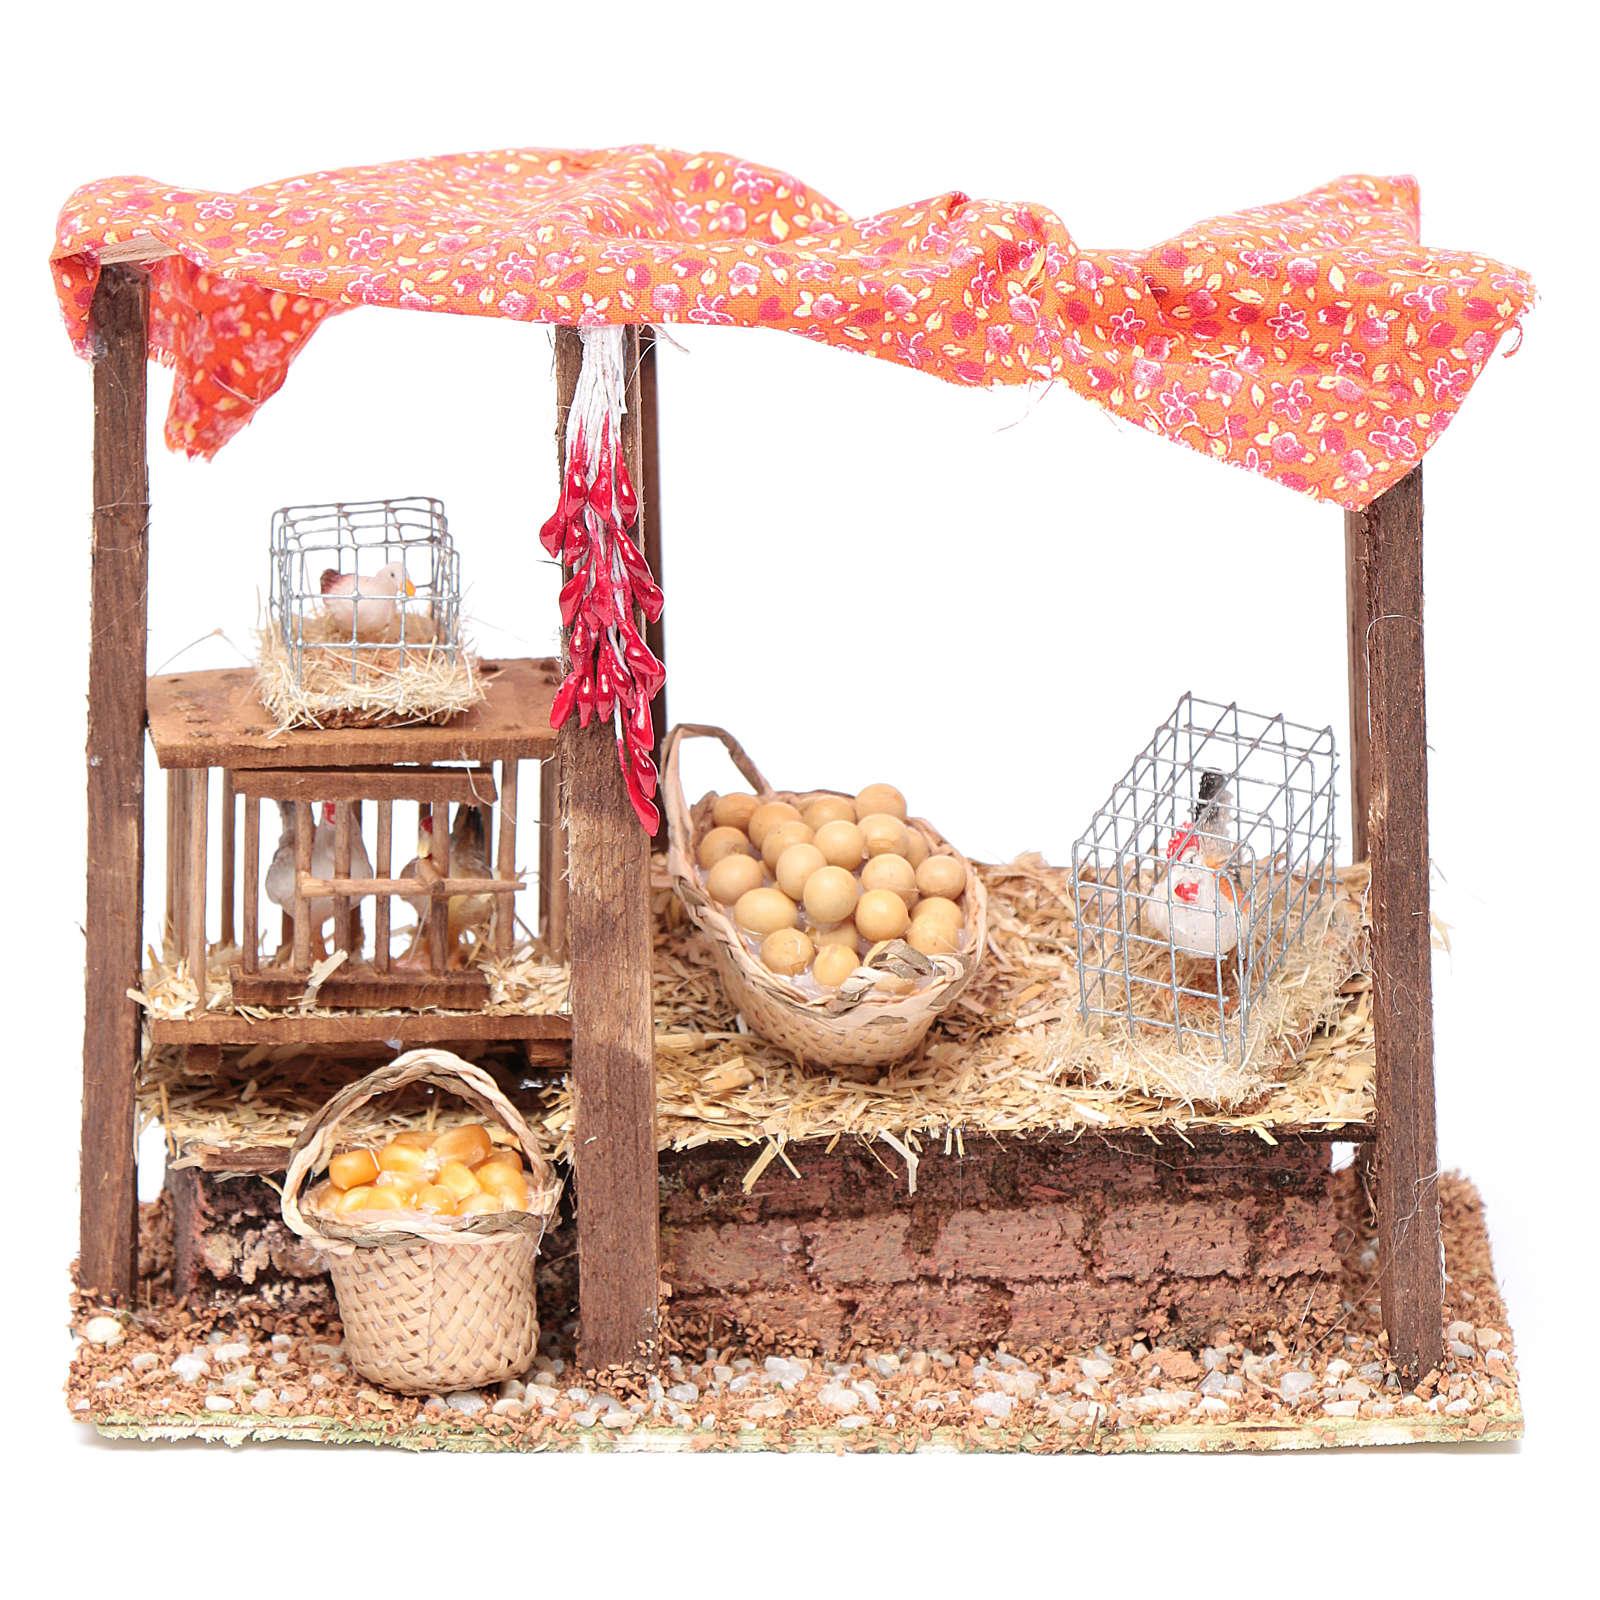 Pollaio per galline presepe 15x20x10 cm 3